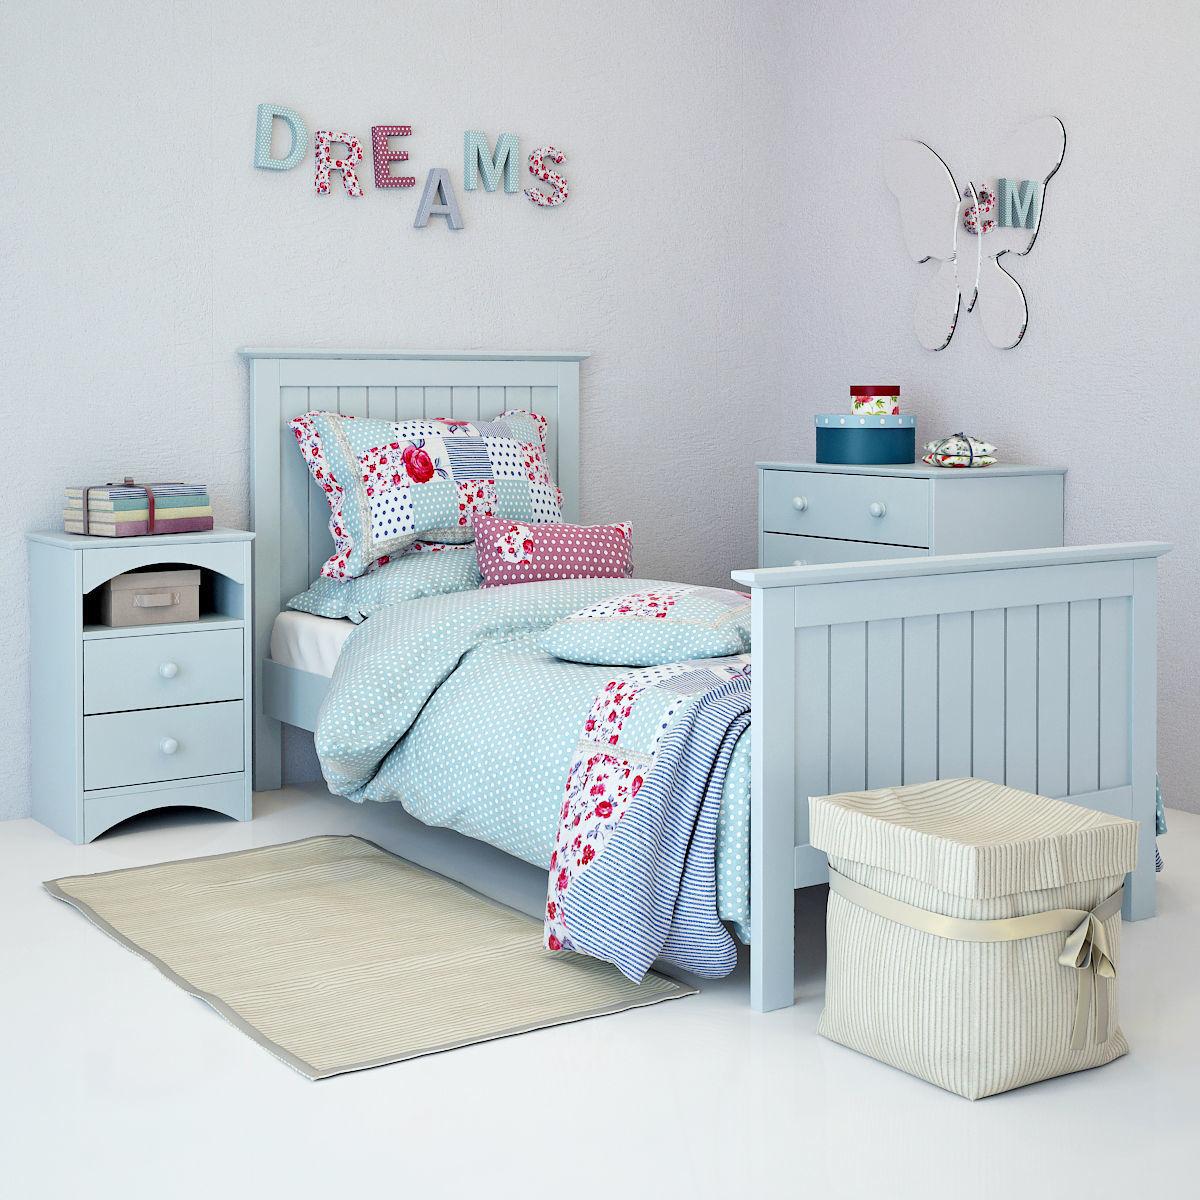 Nursery Furniture Barney 01 | 3D Print Model